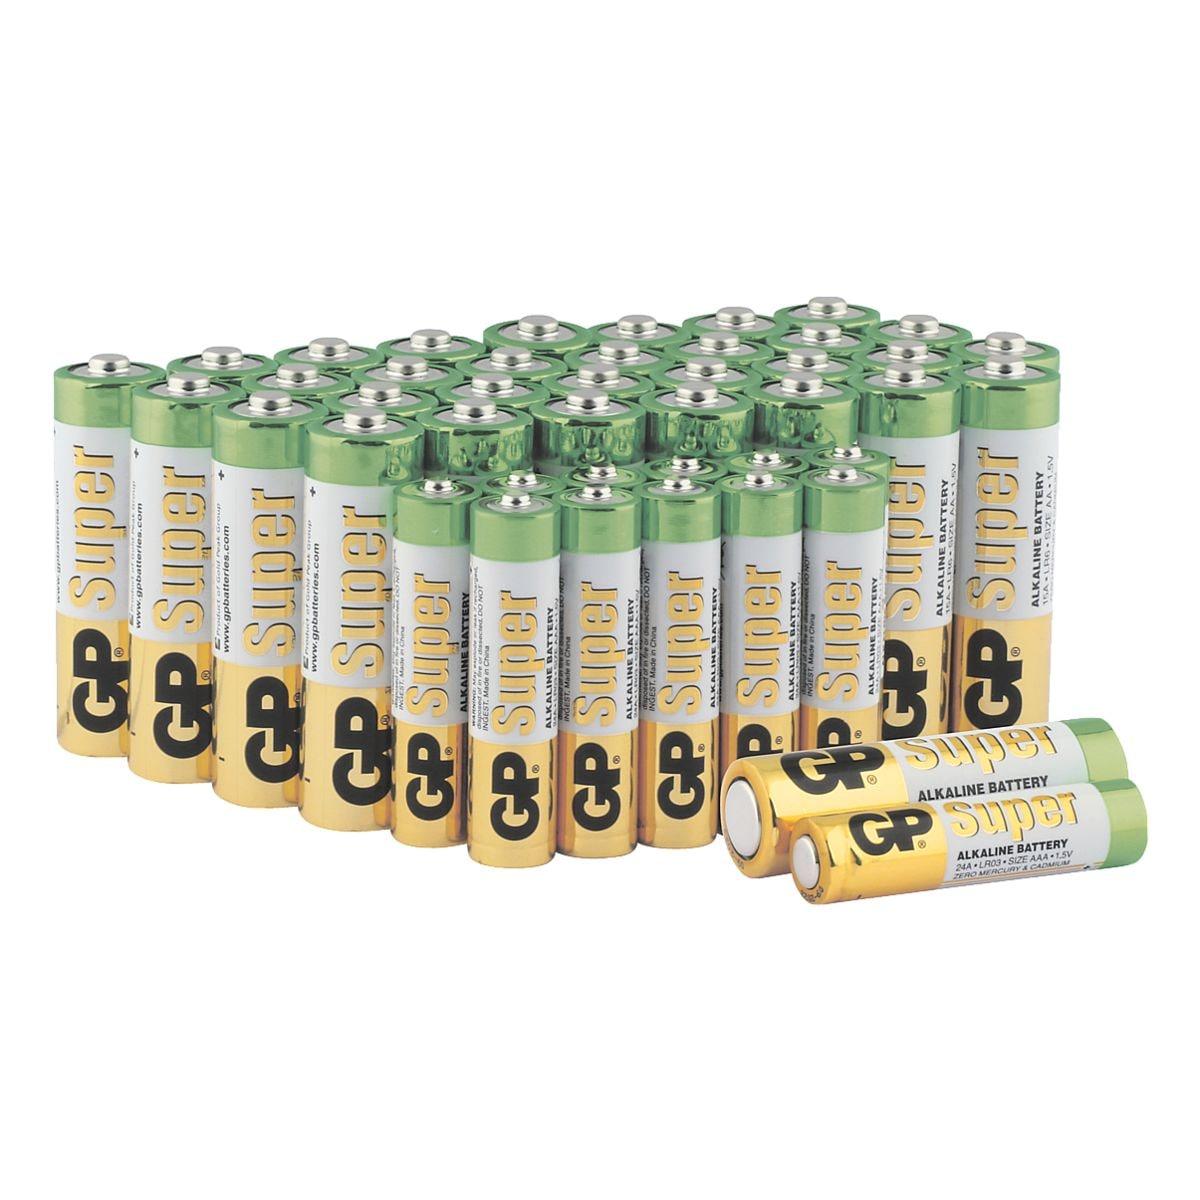 GP Batteries Paquet de 44 piles « Super Alkaline » 32x Mignon / AA / LR06, 12x Micro / AAA / LR03